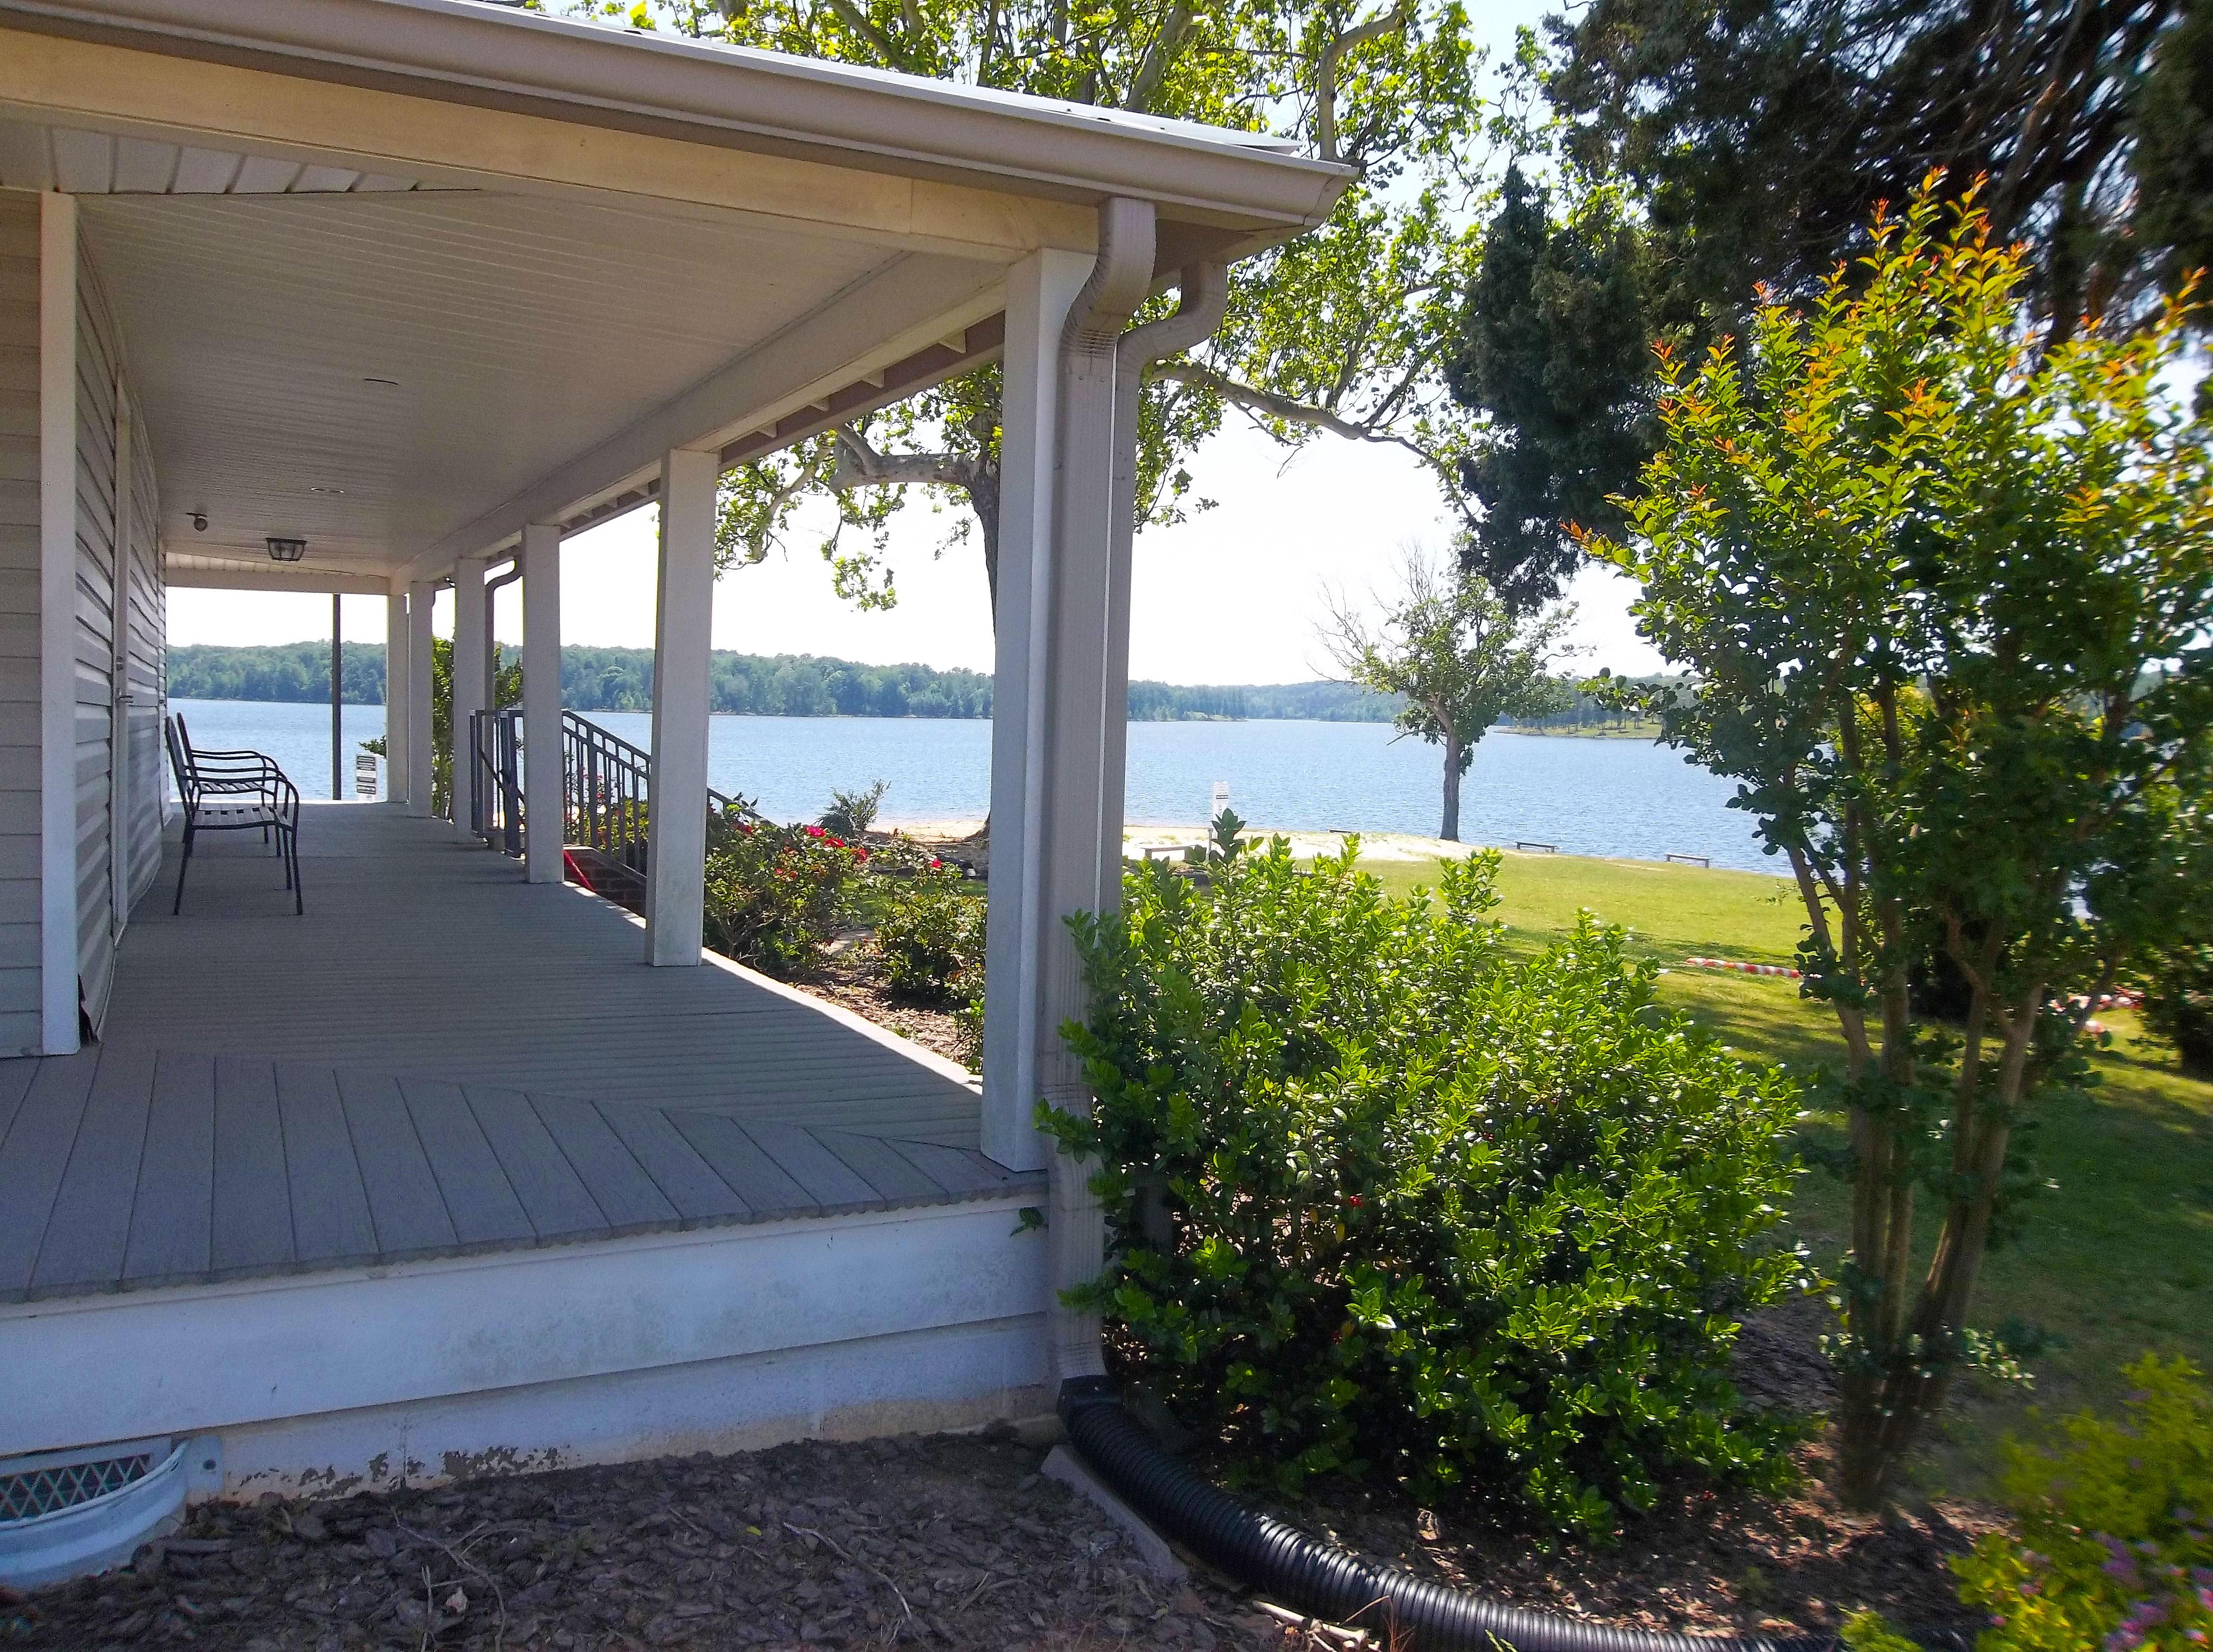 Tennessee carroll county clarksburg - Lake Headquarters